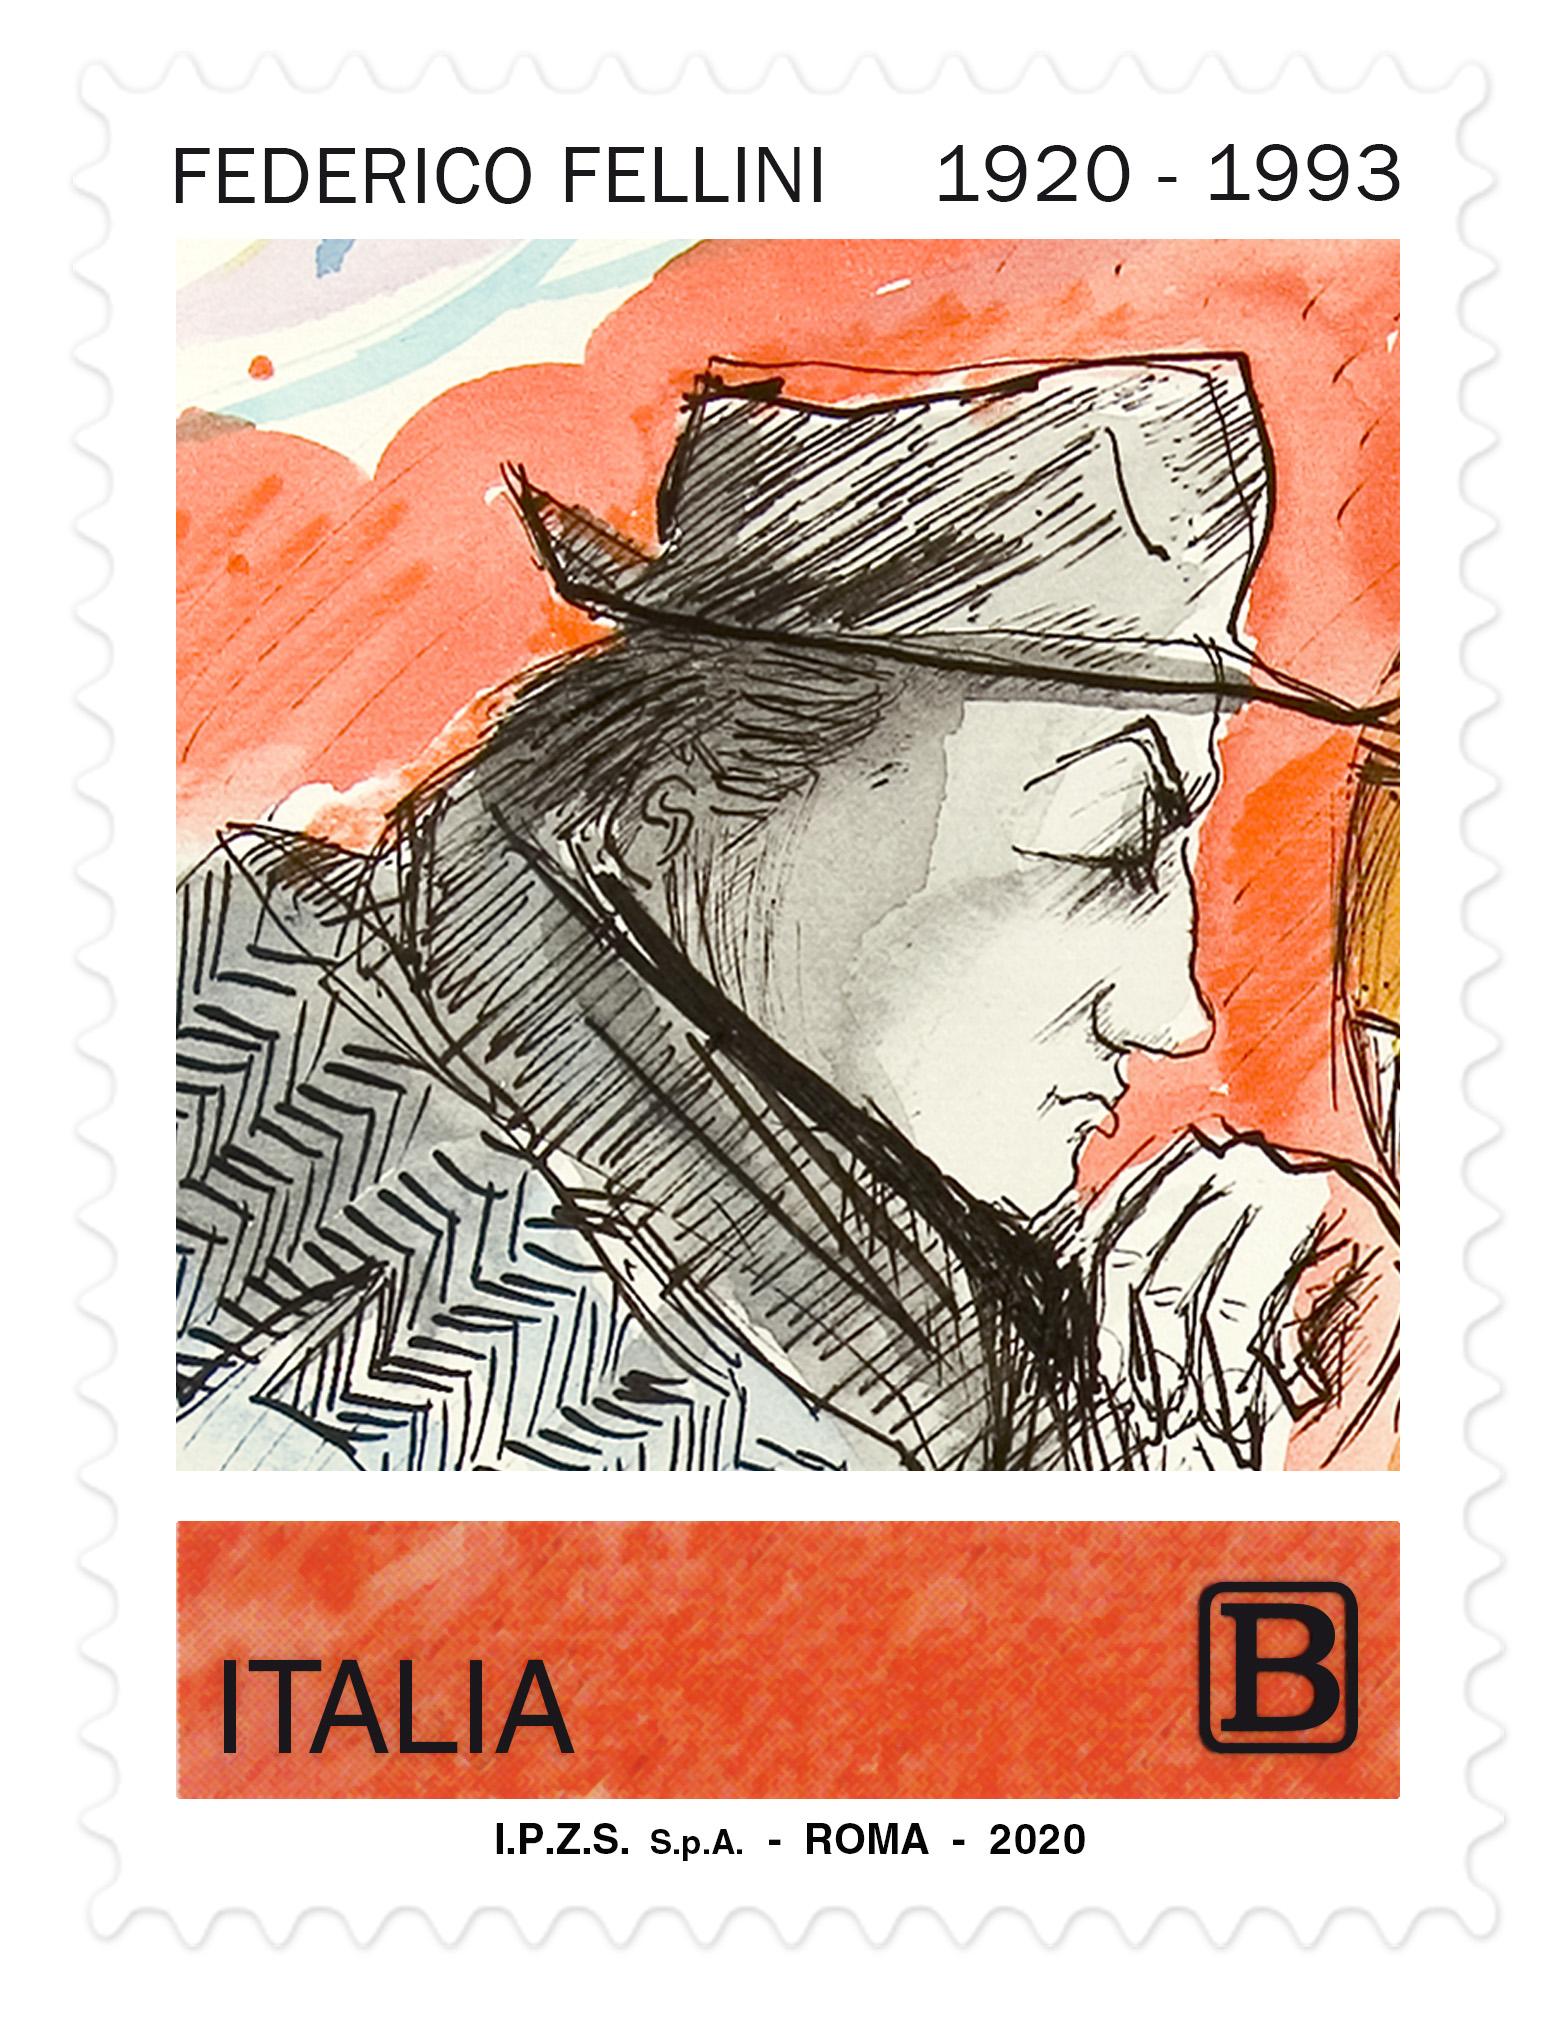 fellini francobollo